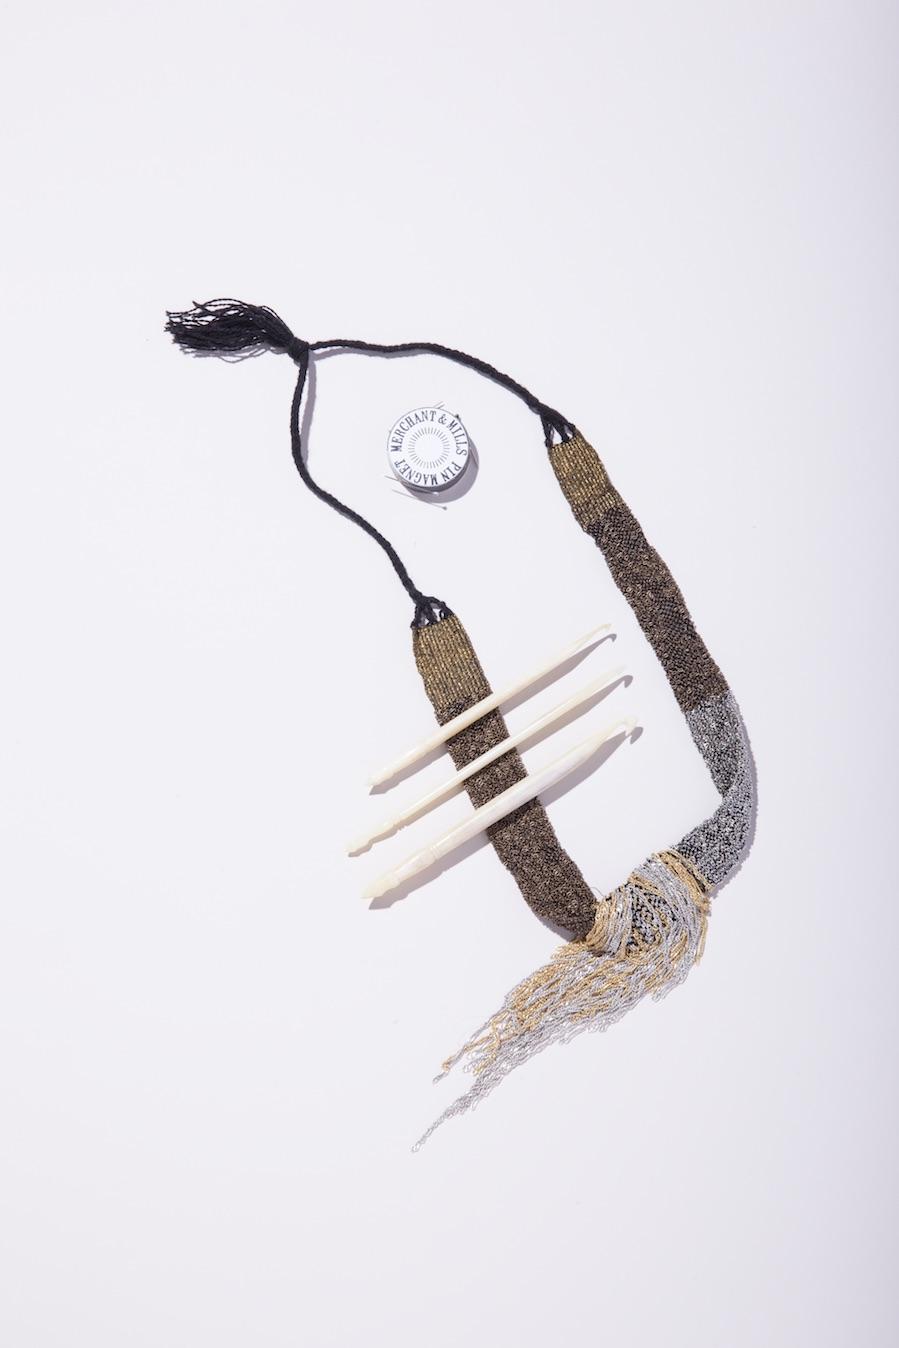 Jess Feury  Beaded Necklace;  Fringe Supply Co  Bone Crochet Hooks;  Merchant & Mills  Pin Magnet.